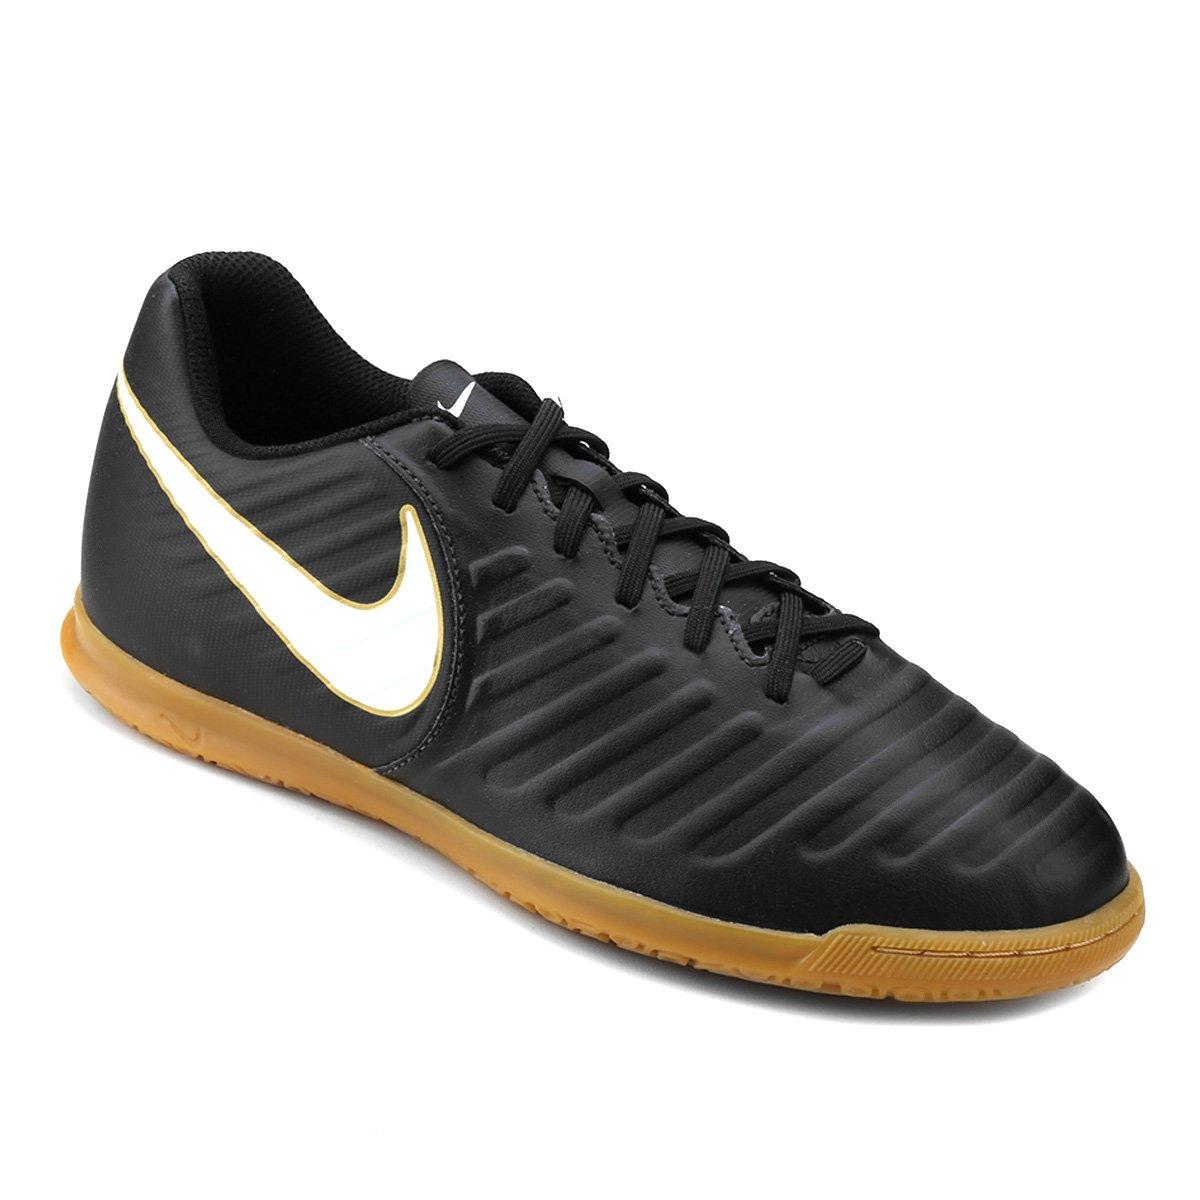 992ac7e8a2 Chuteira Futsal Nike Tiempo Rio 4 IC - Preto e Branco - Compre Agora ...